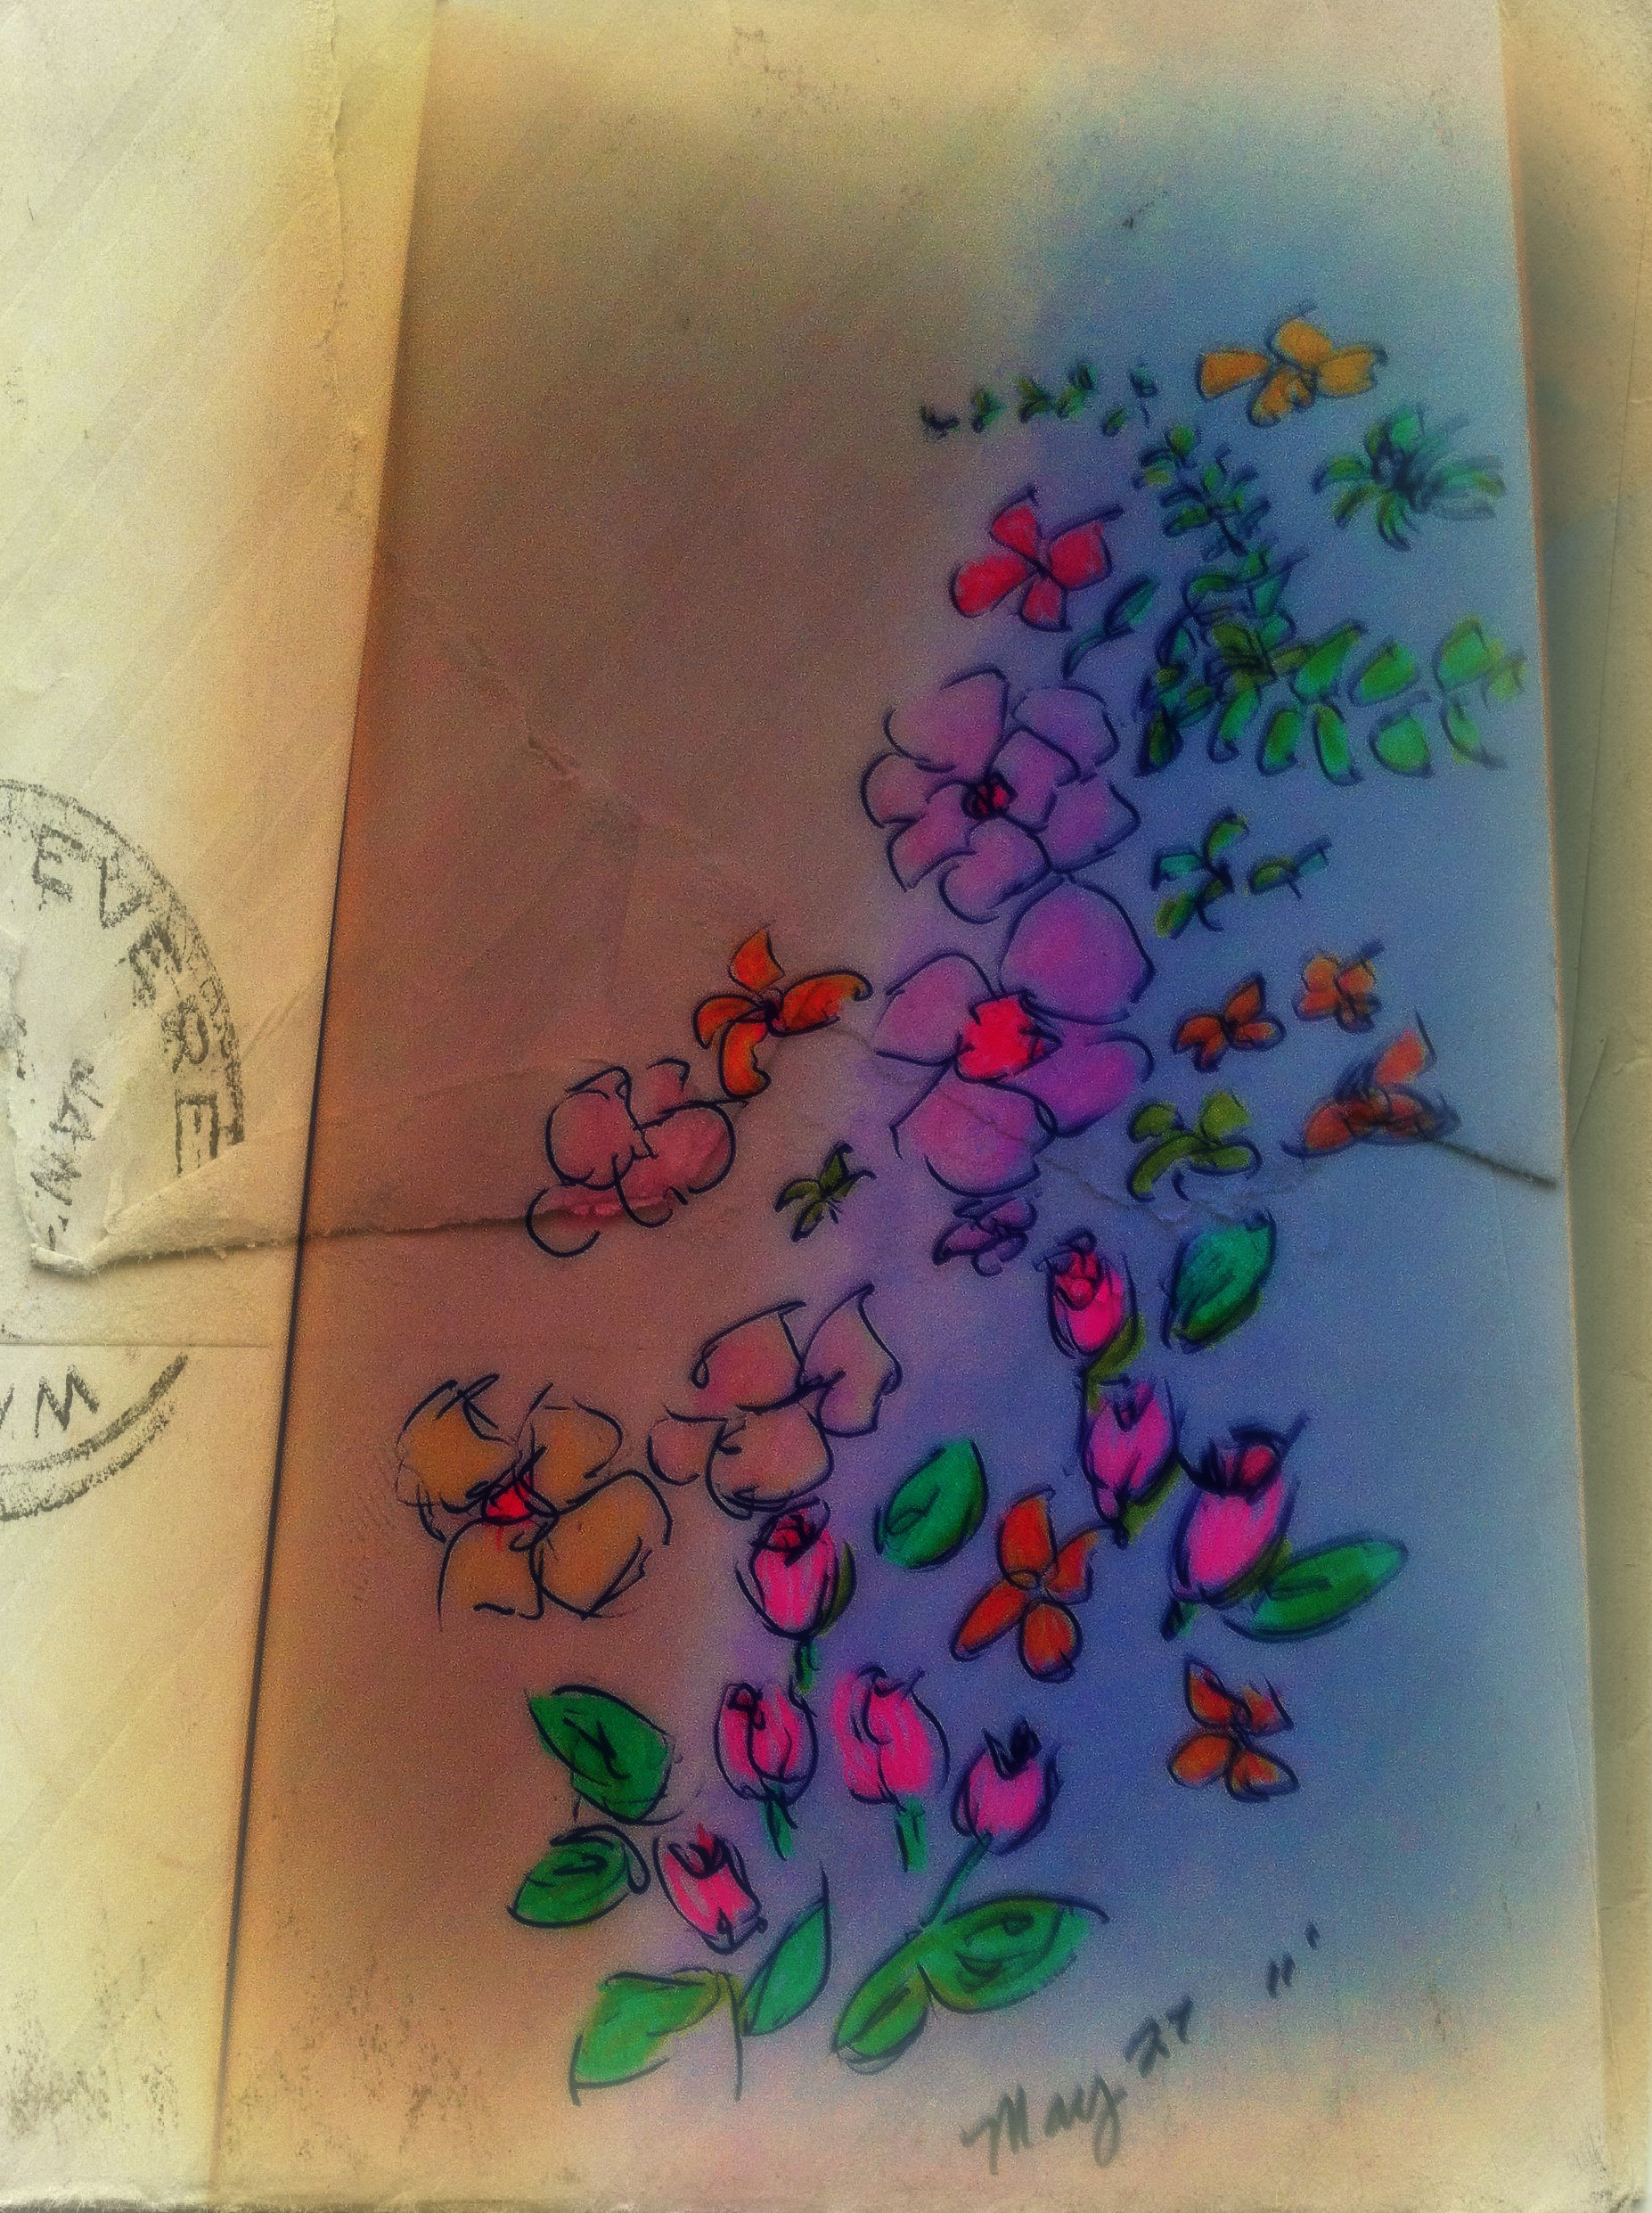 Midori doodles